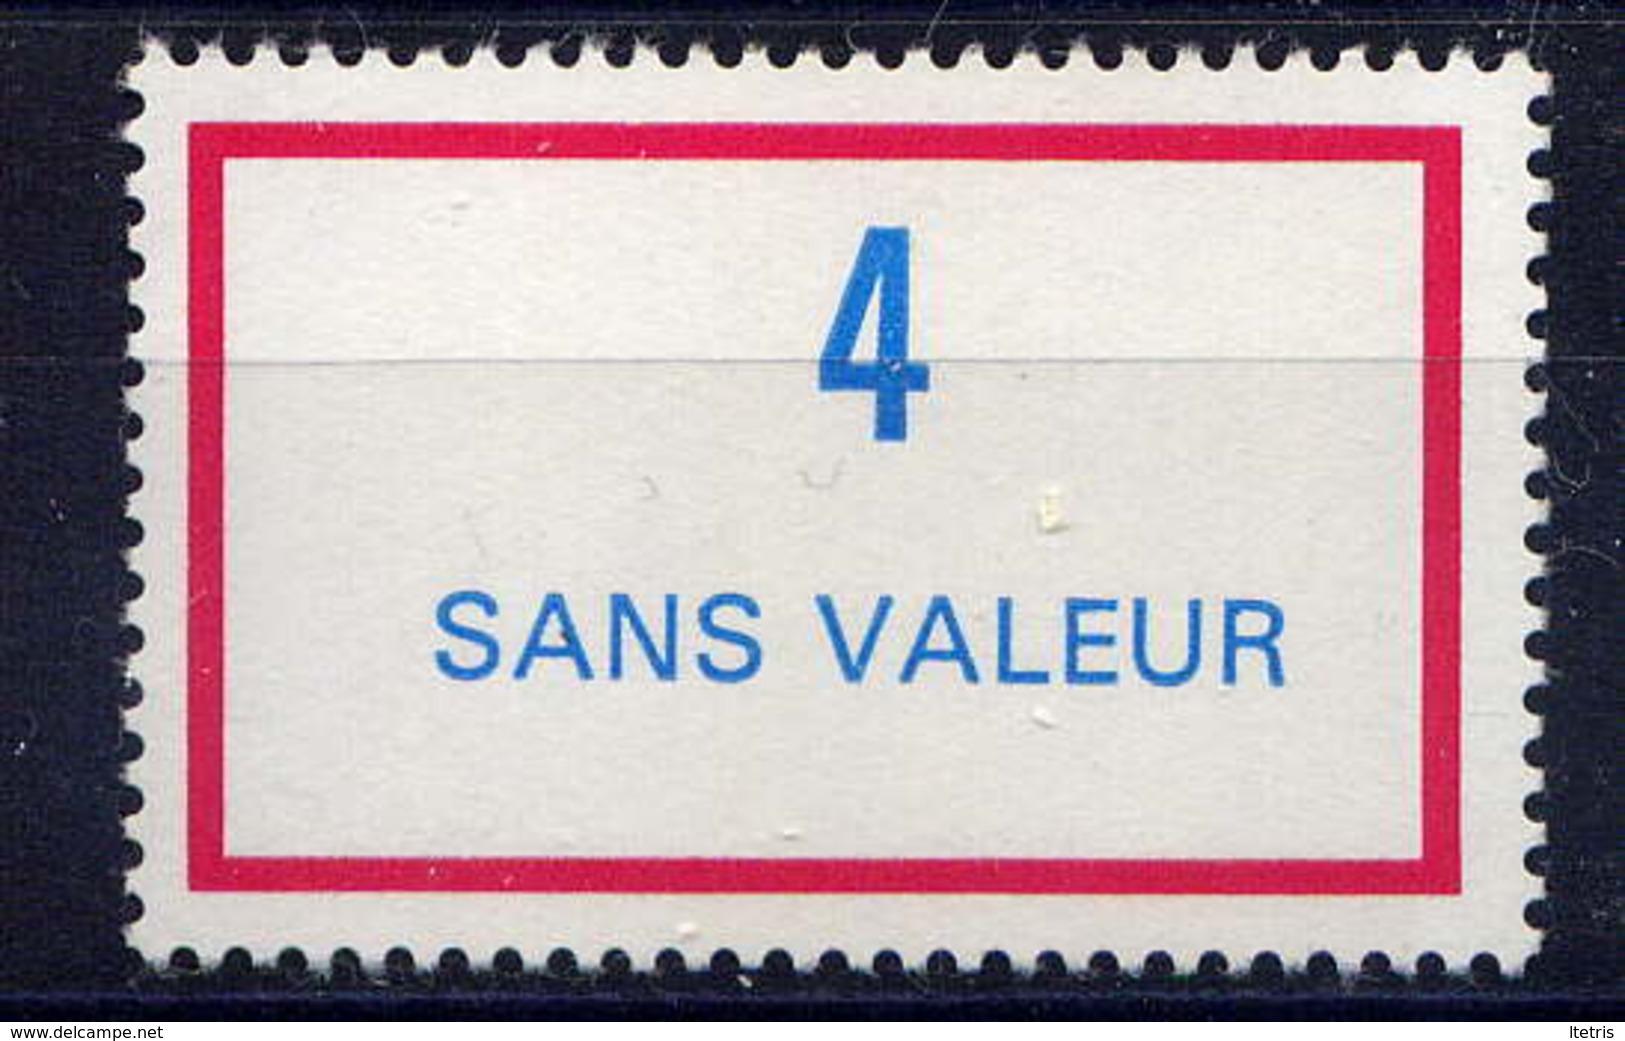 FRANCE - F246** - FICTIF EMISSION 1989 - Phantomausgaben